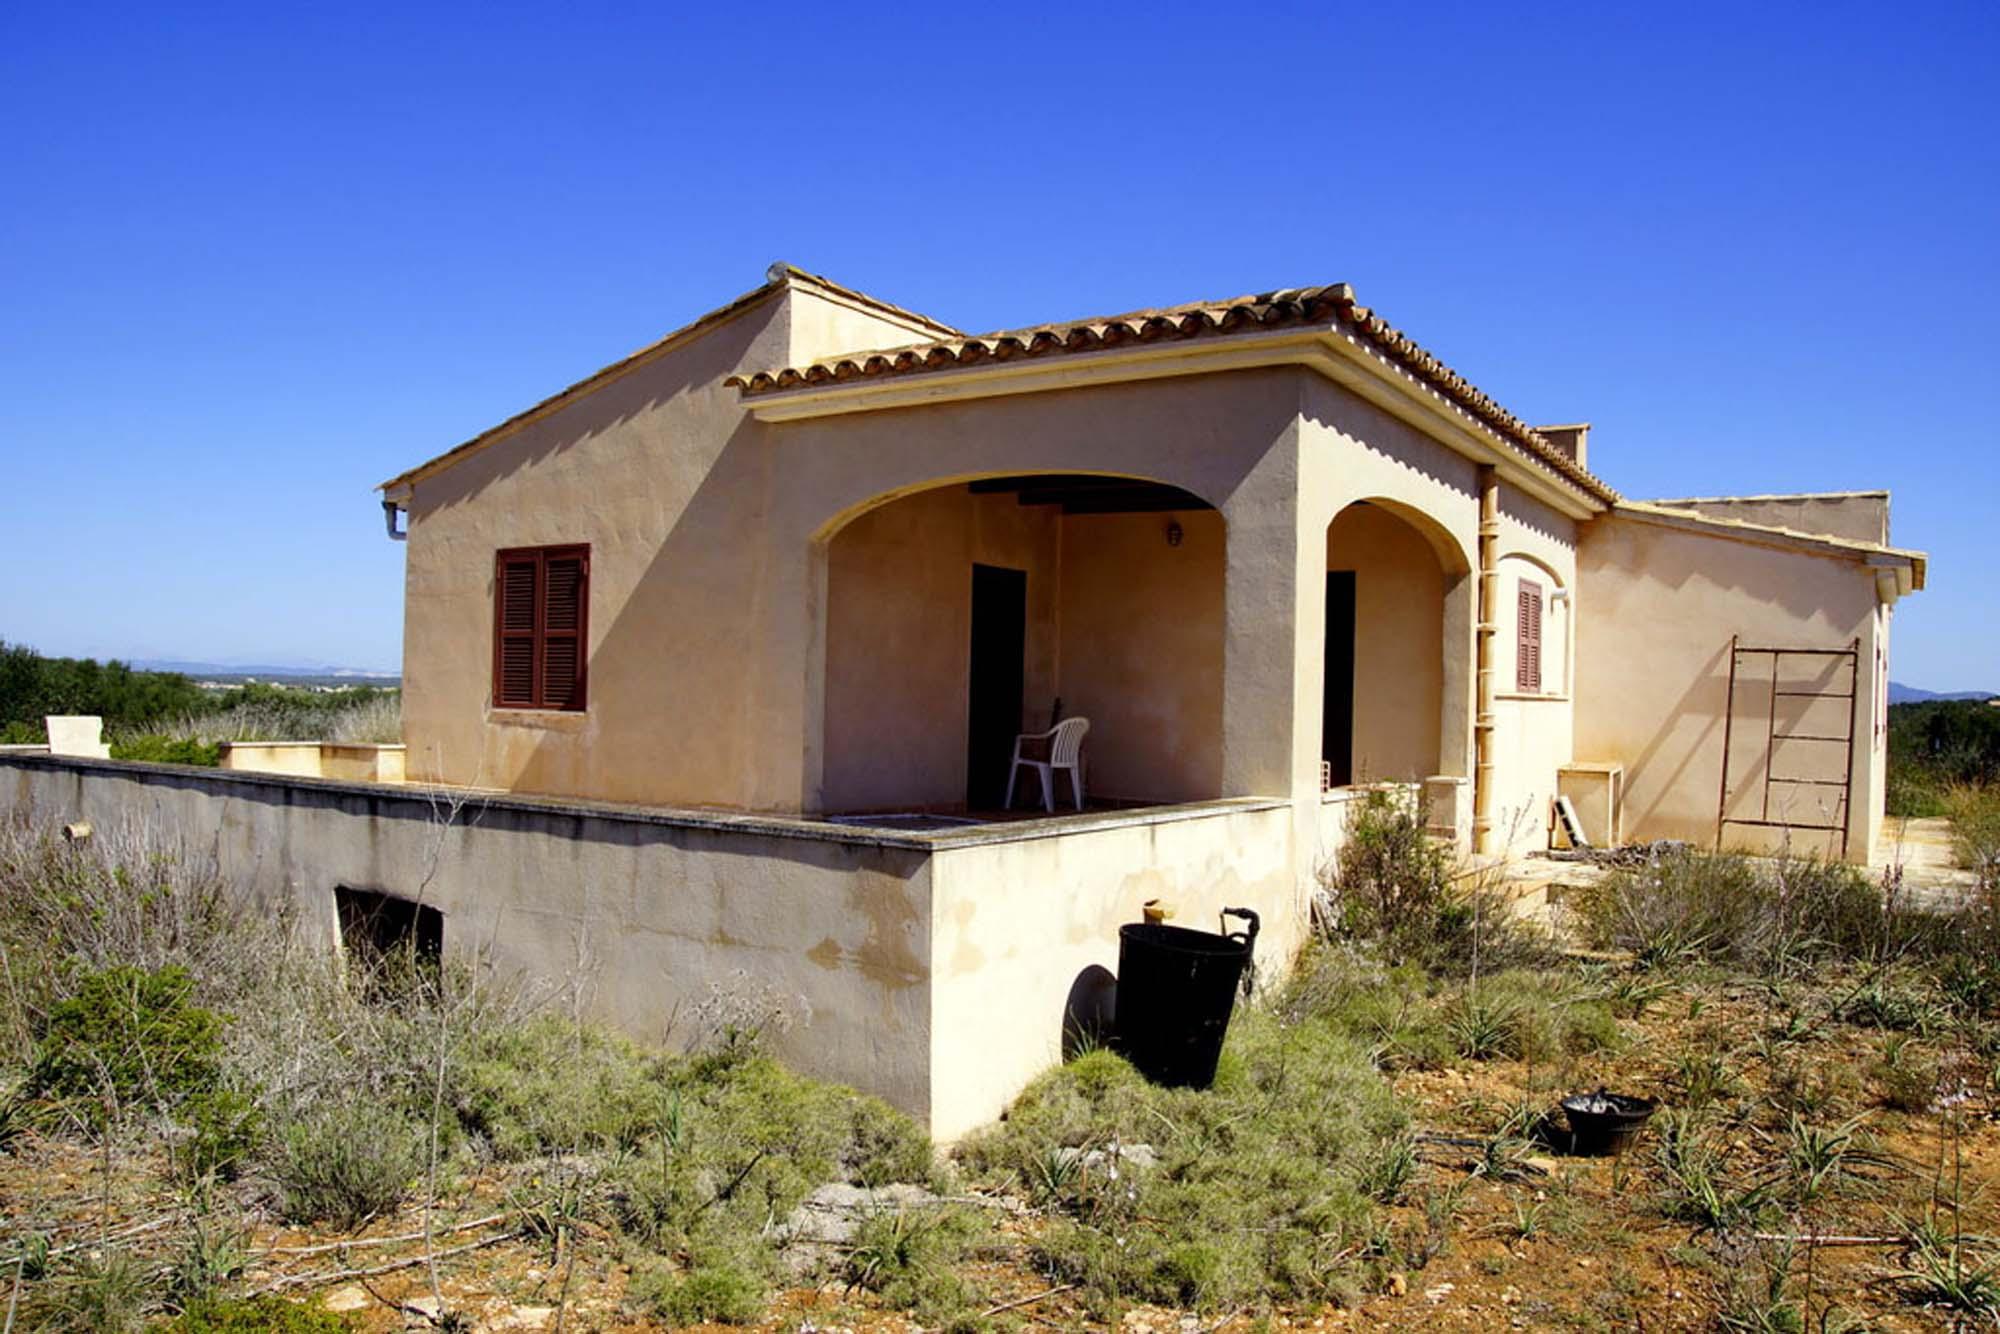 Terreno en ubicaci n privilegiada inmobiliaria sud mallorca for Terrenos en mallorca